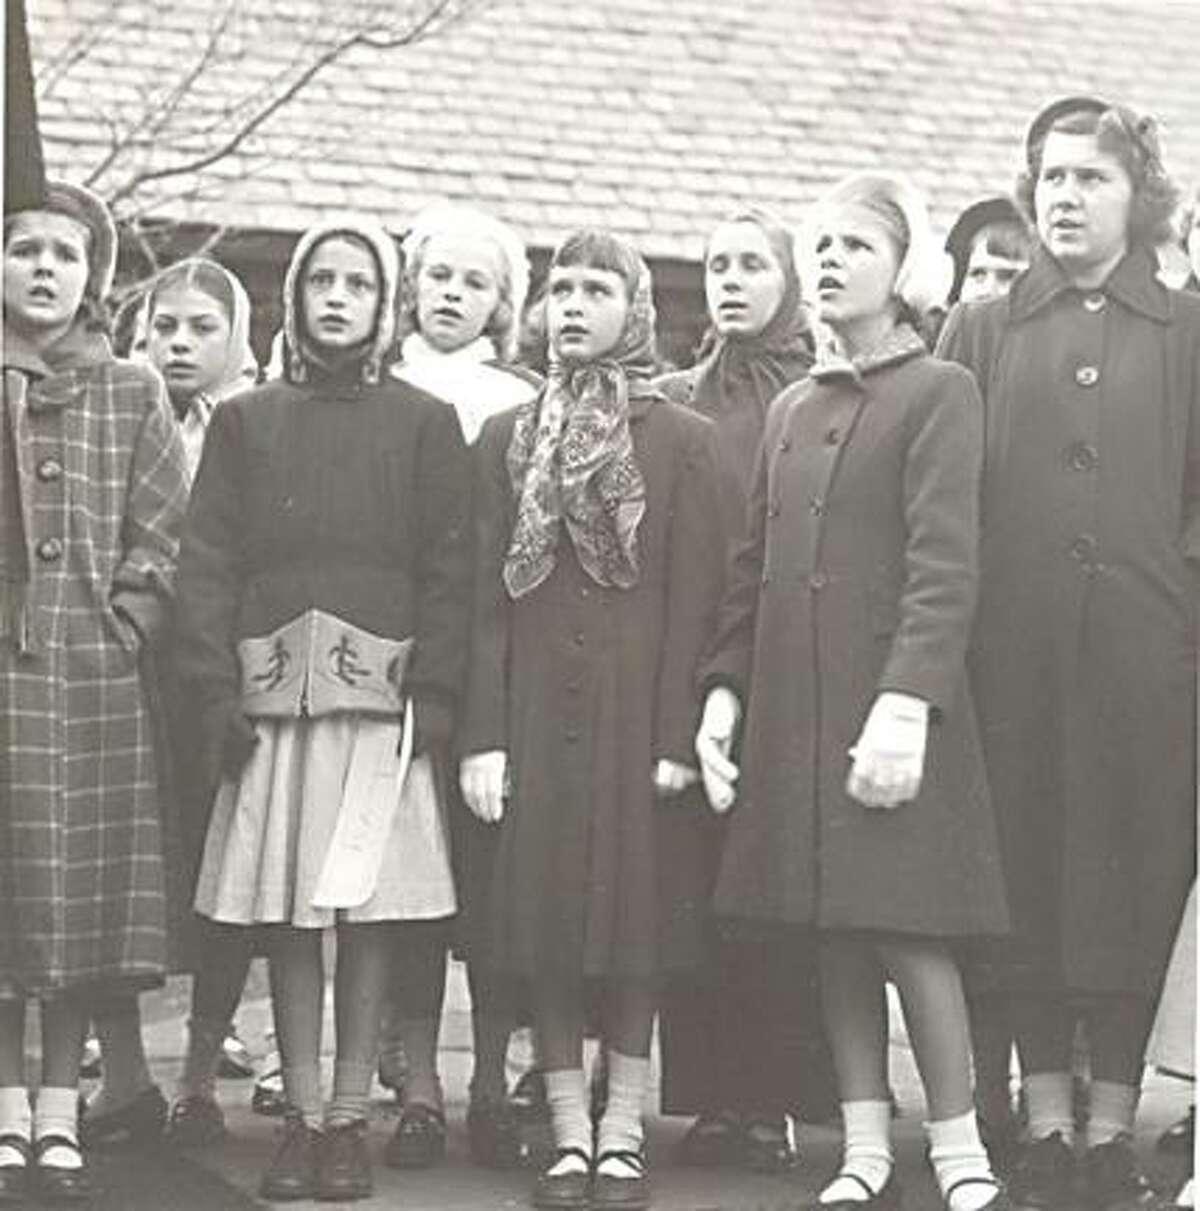 Children visit Christmas Village in Torrington in this 1952 file photo.